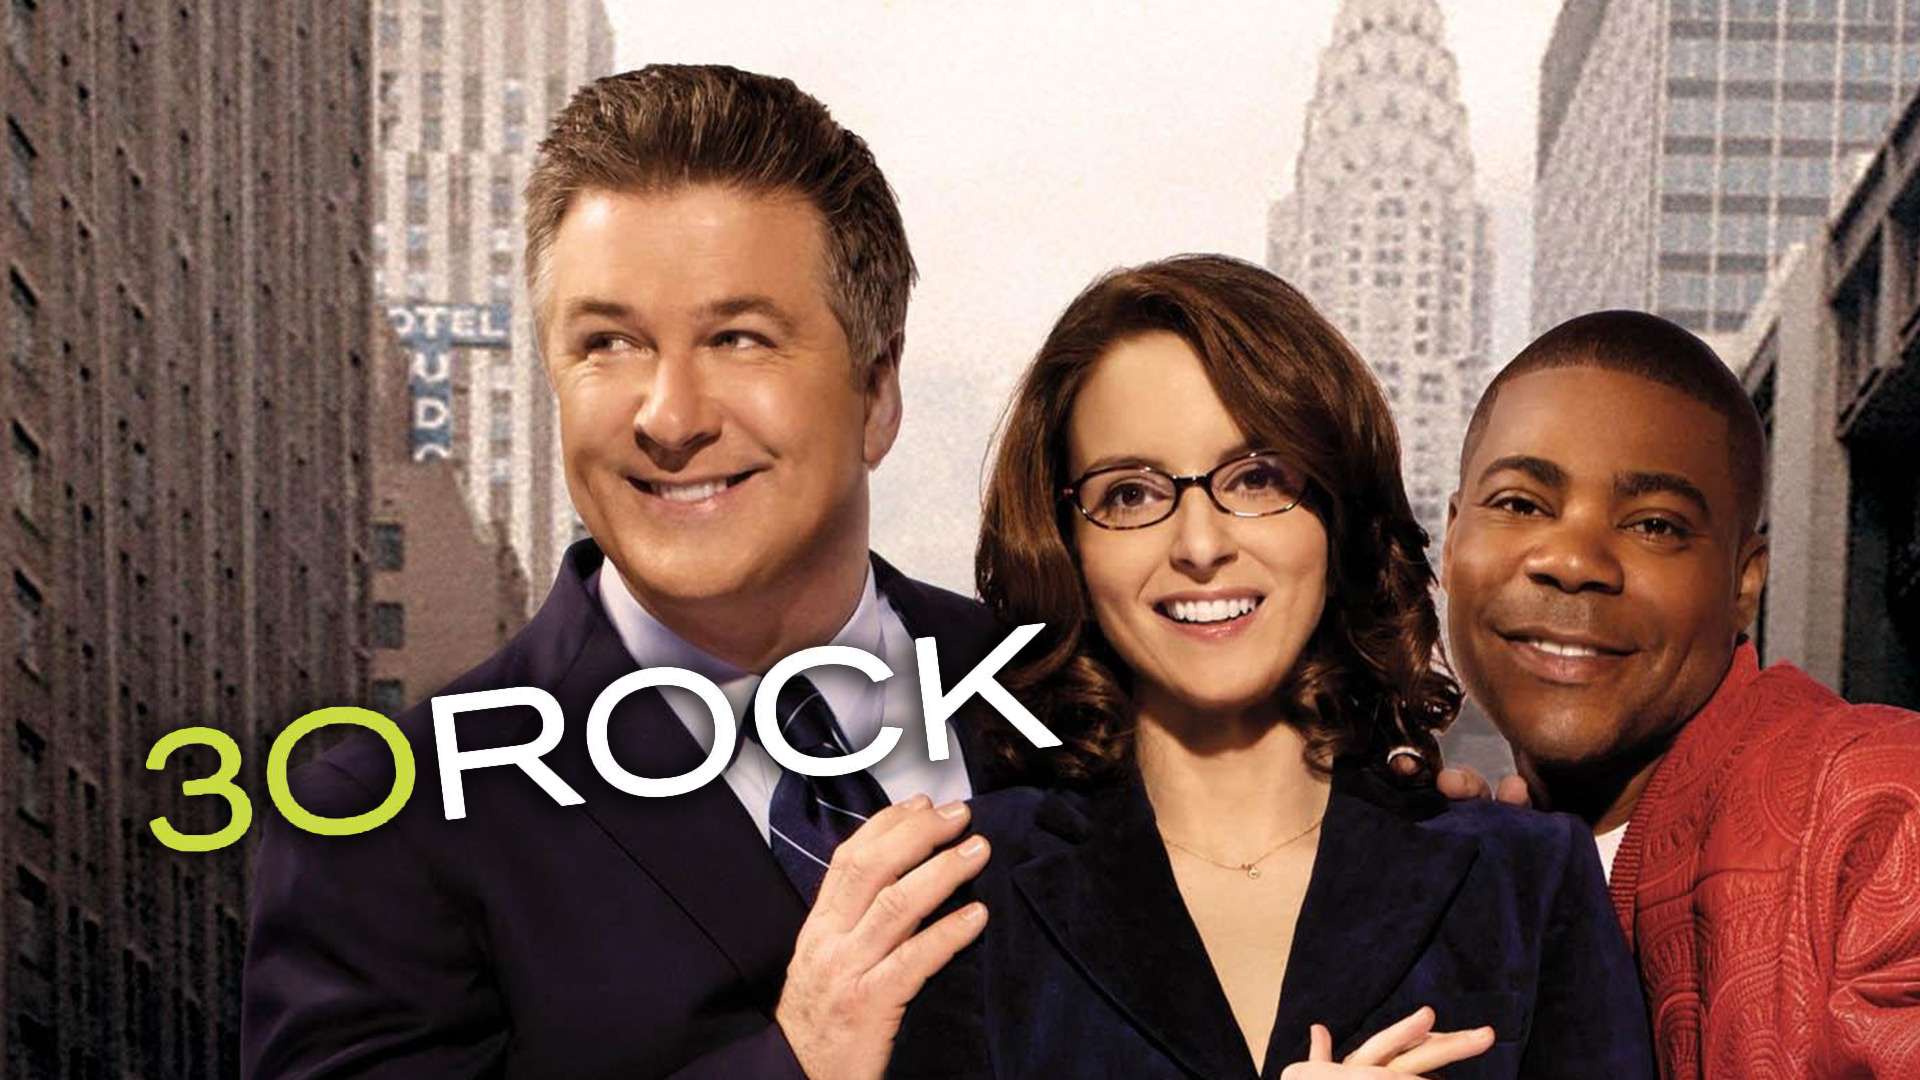 30 Rock Season 1